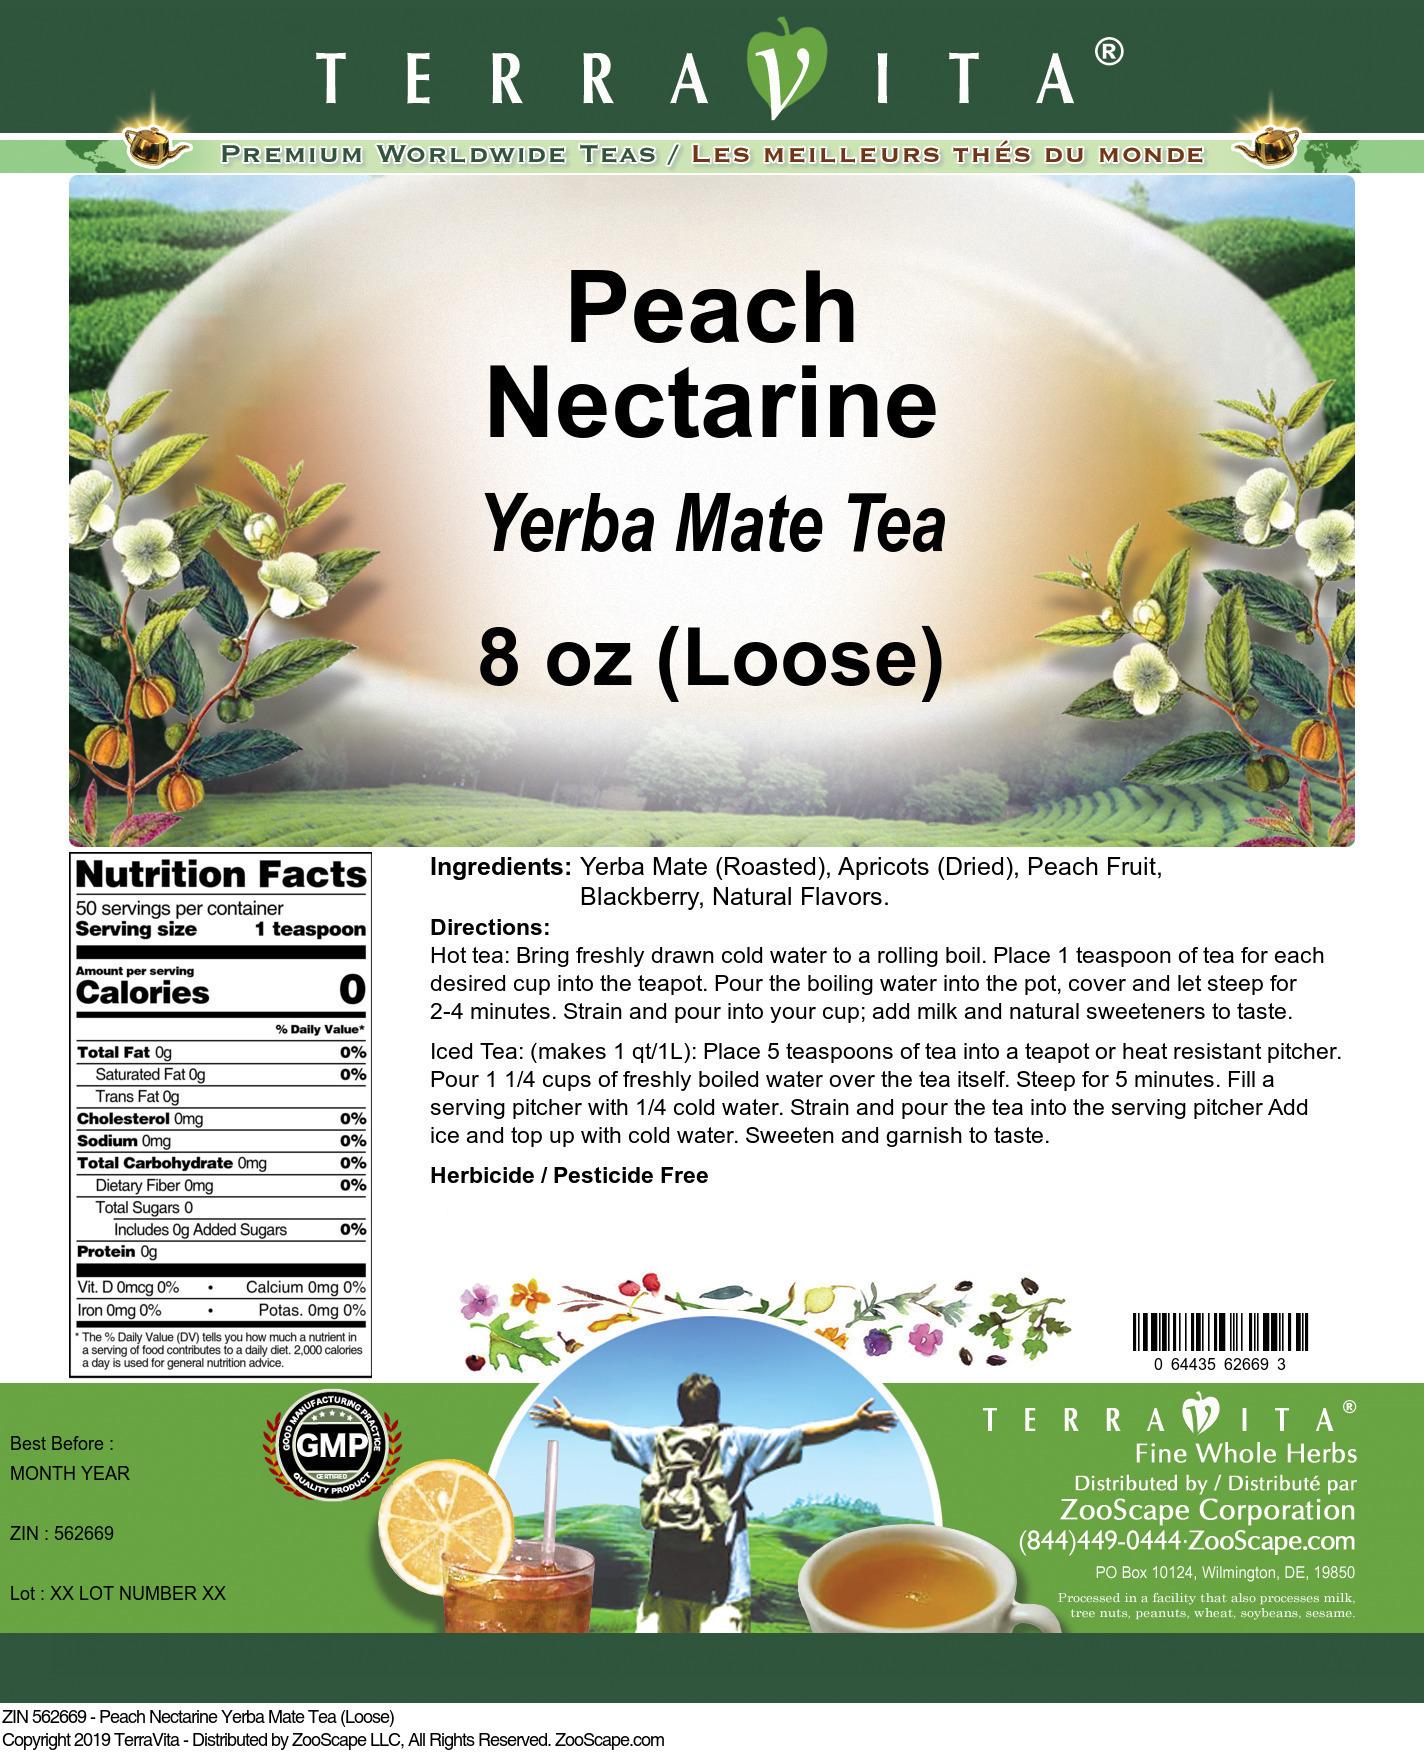 Peach Nectarine Yerba Mate Tea (Loose)